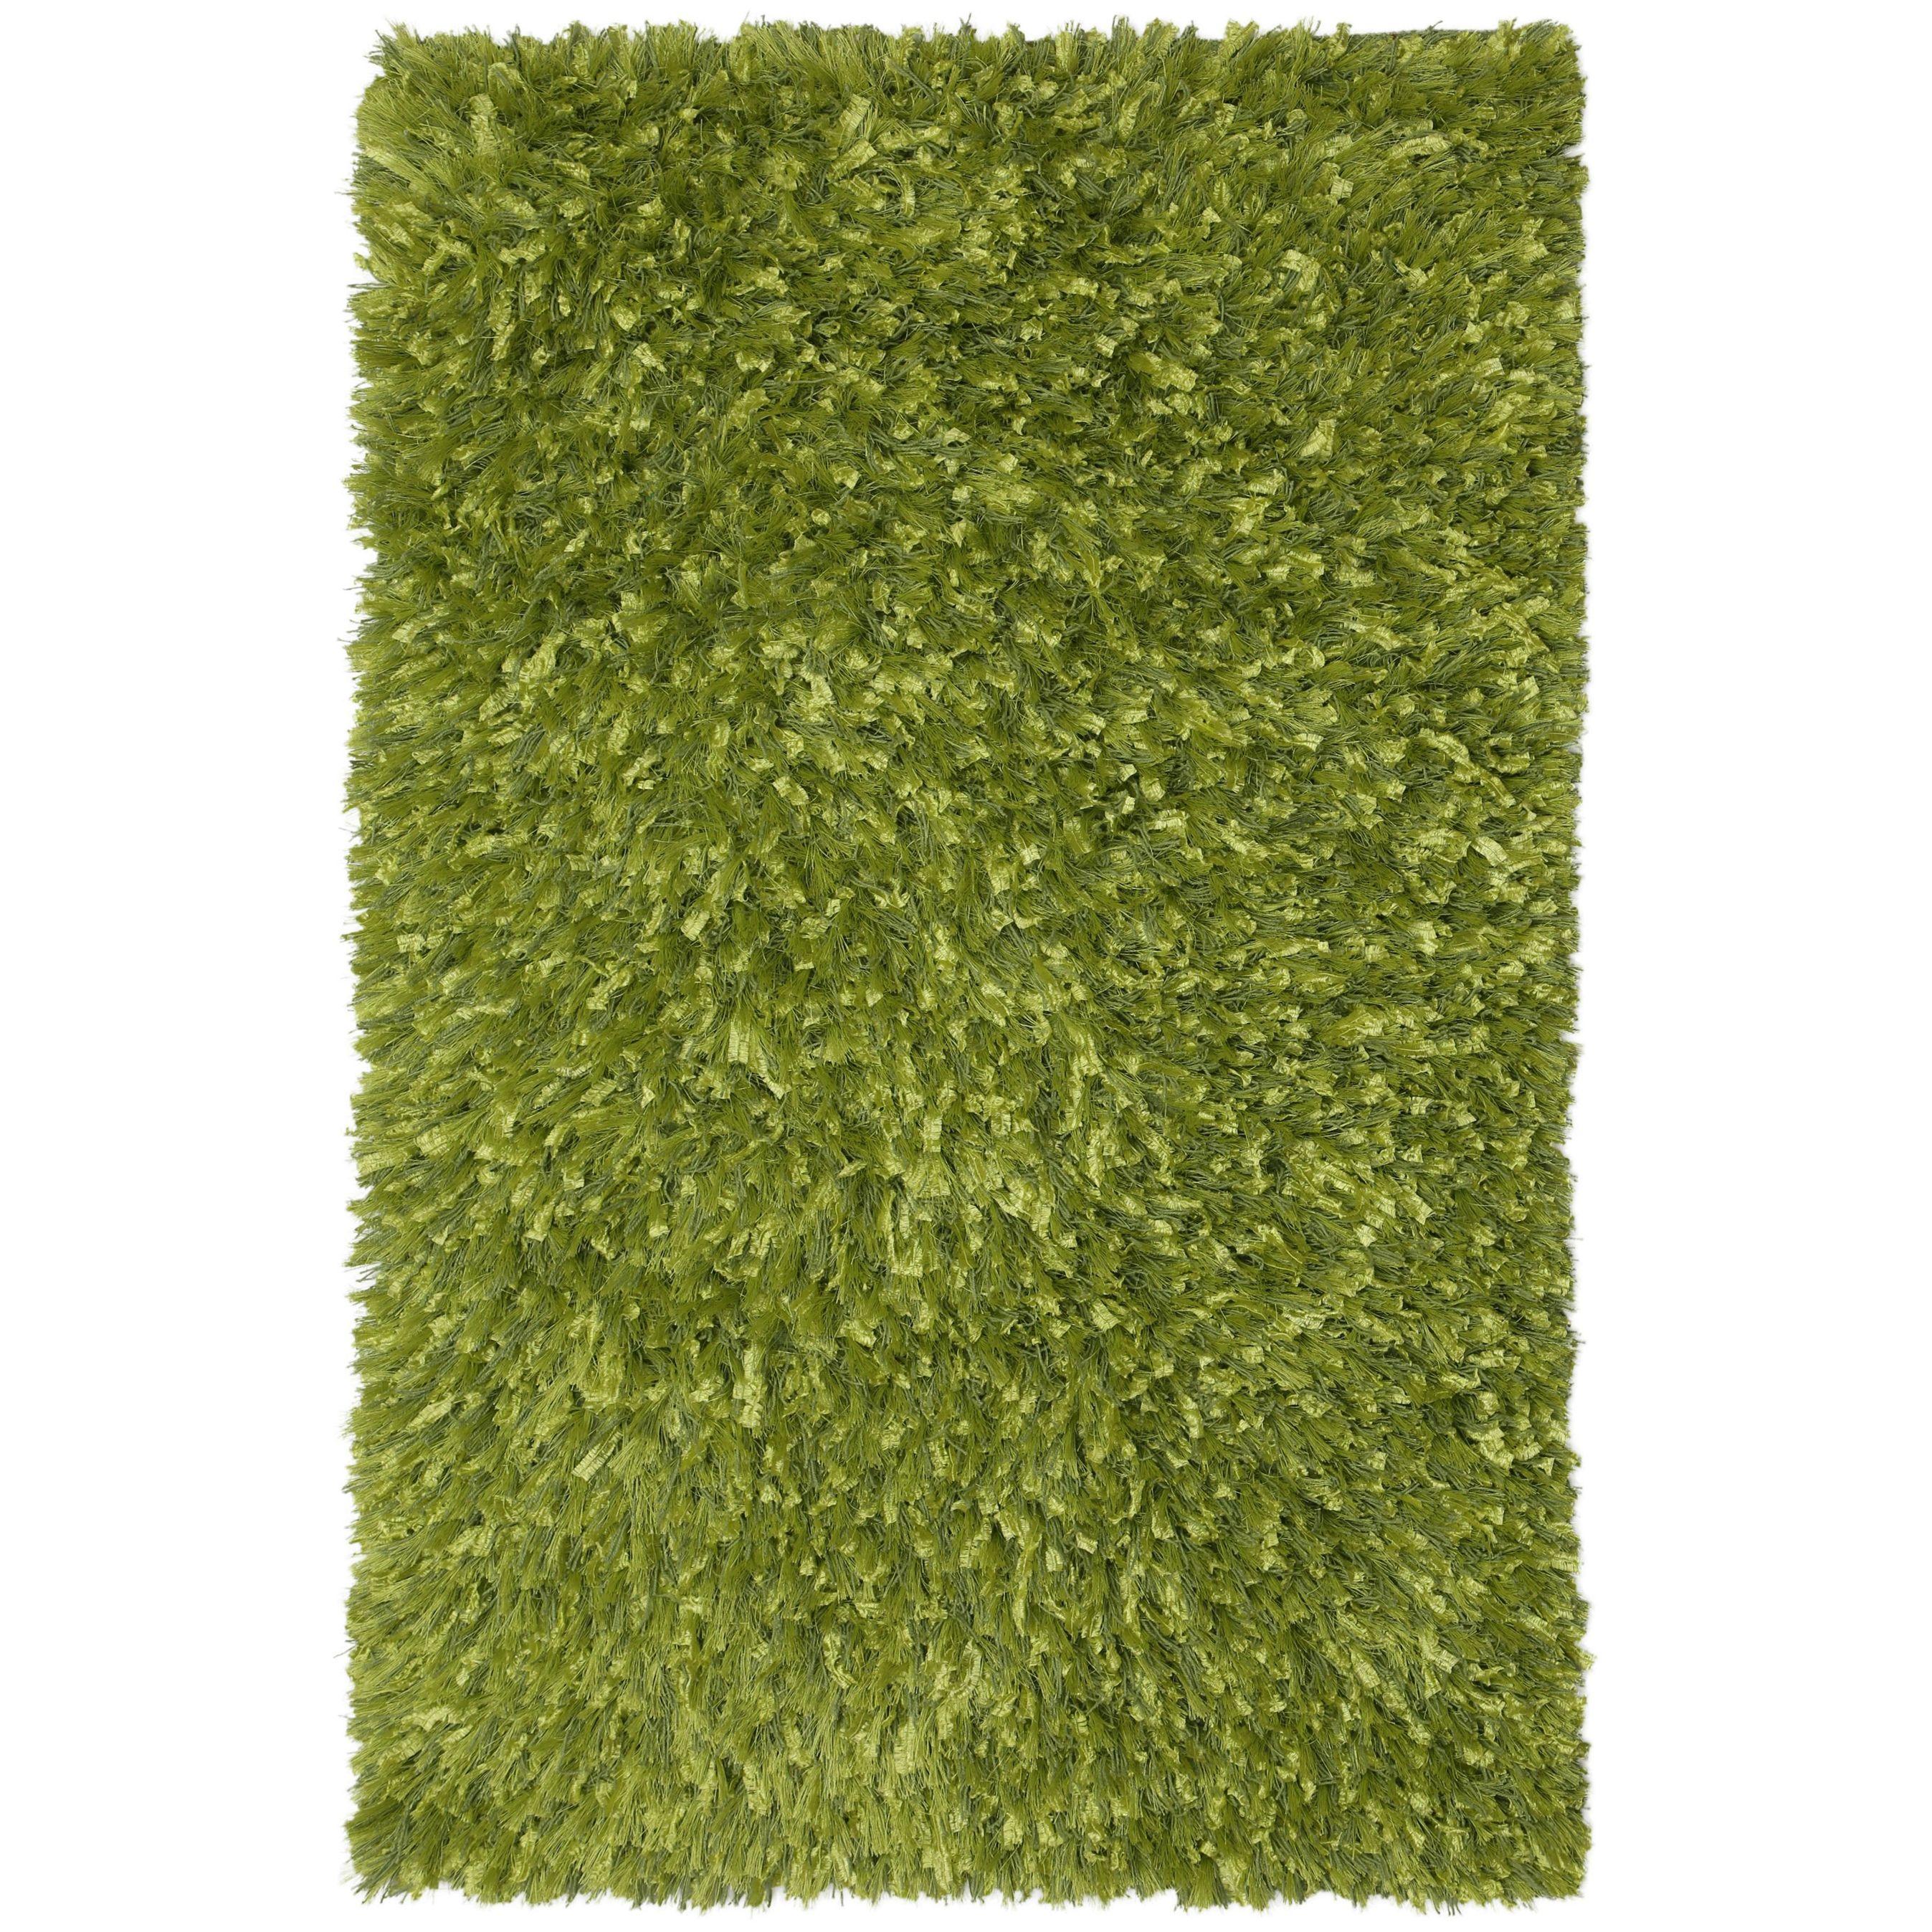 "Green Shimmer Shag Rug (21 x 34-inch) (Green Shimmer Shag (21""x34"") Rug), Size 2' x 3' (Cotton, Abstract)"